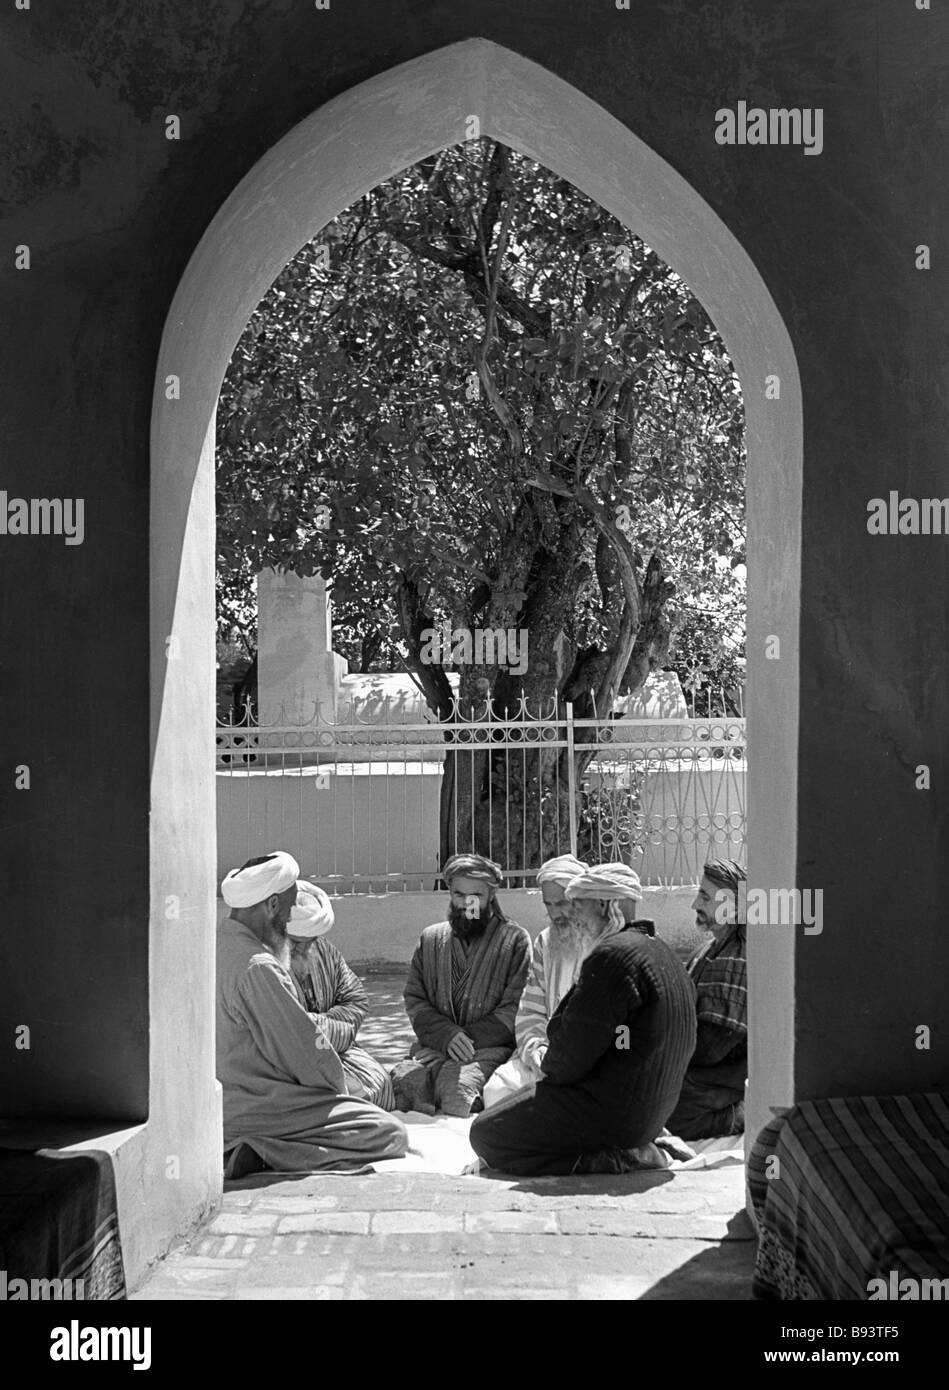 Tashkent Muslims conversing in a mosque yard - Stock Image